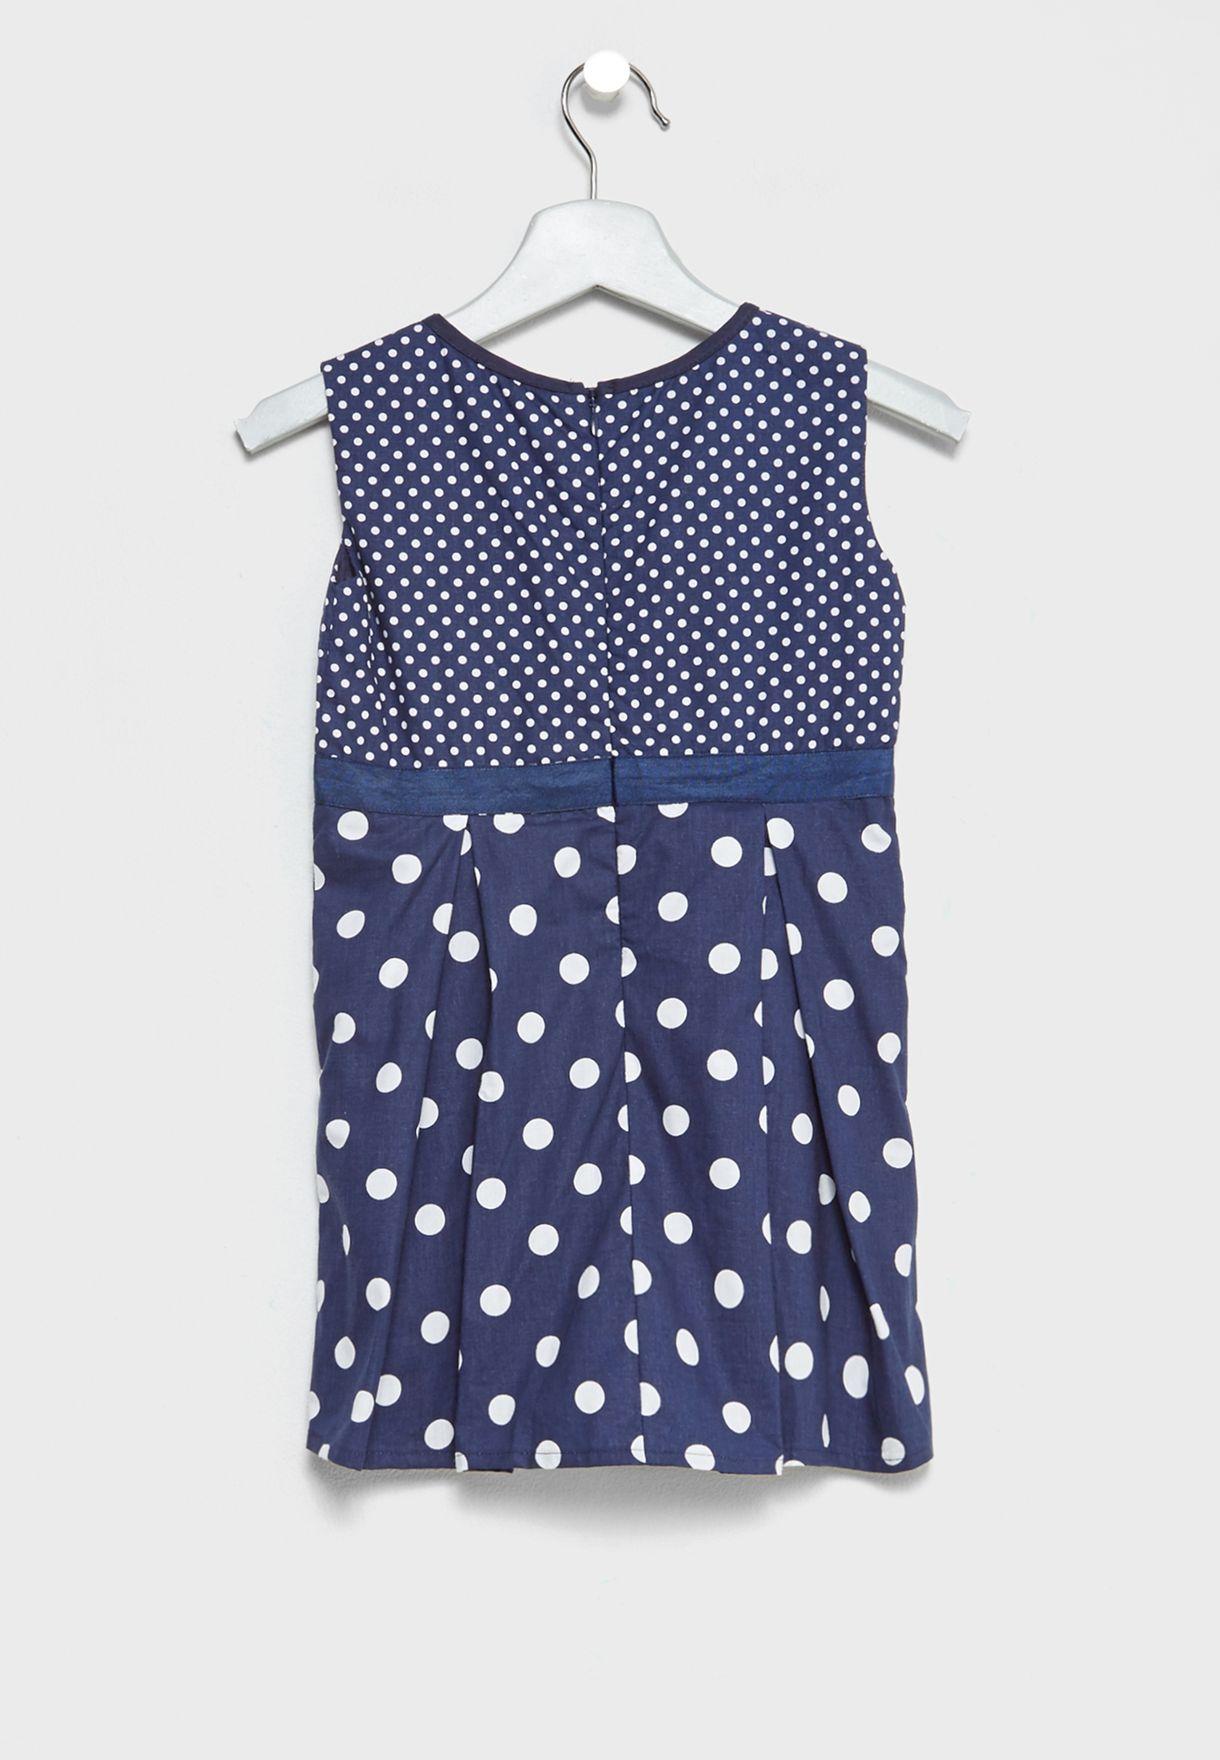 فستان بطبعات نقوط